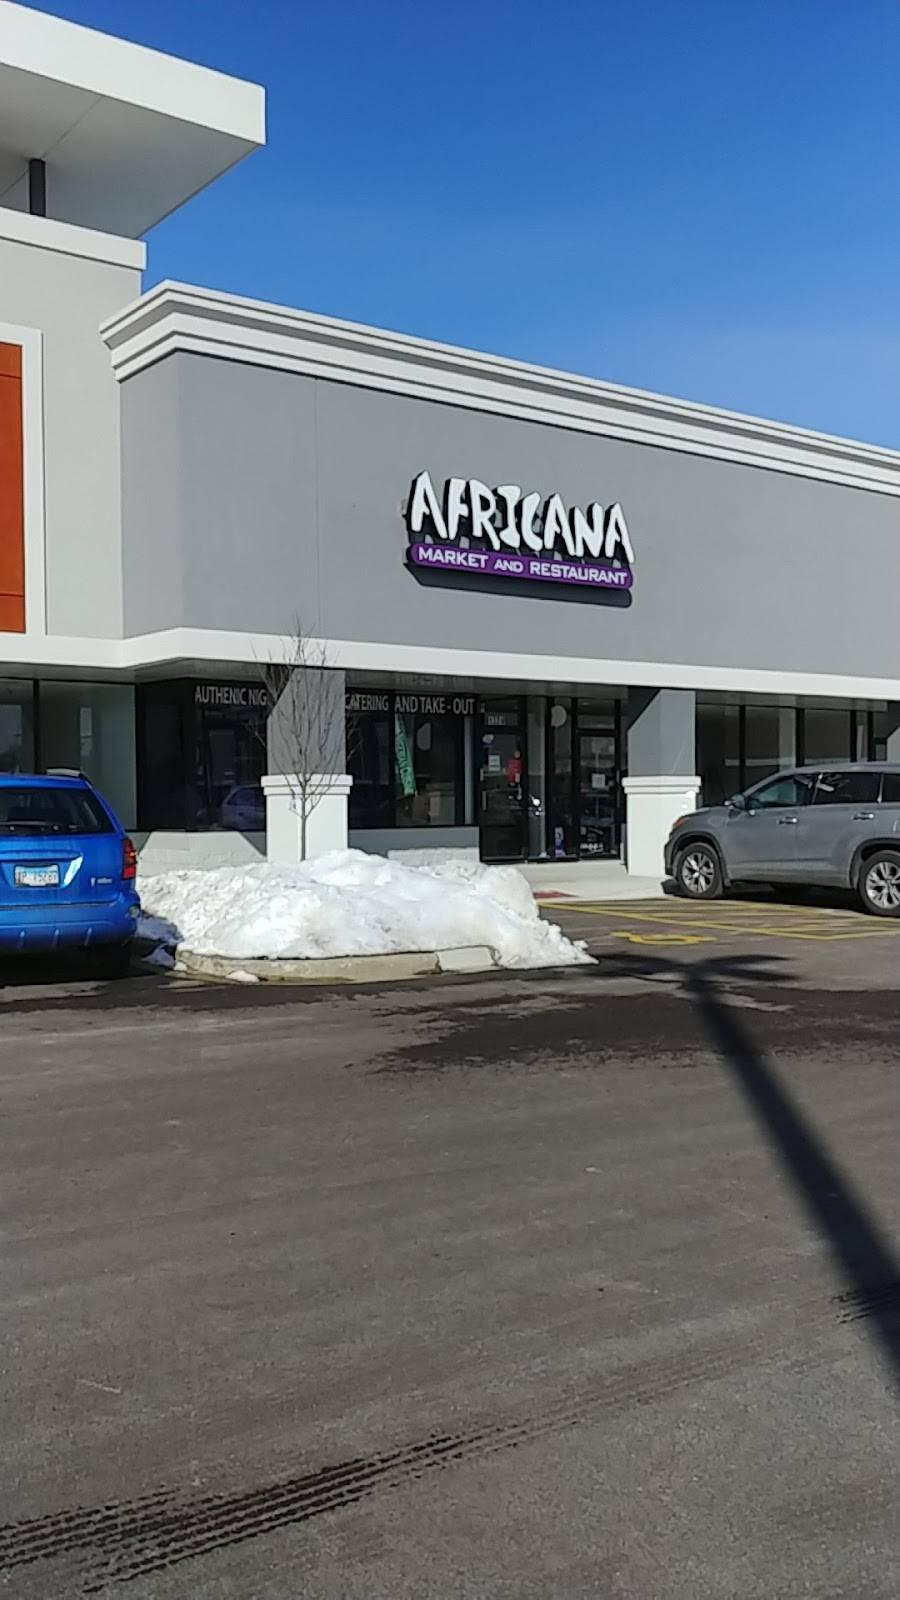 Africana market and restaurant | restaurant | 1324 E Algonquin Rd, Algonquin, IL 60102, USA | 2242098178 OR +1 224-209-8178